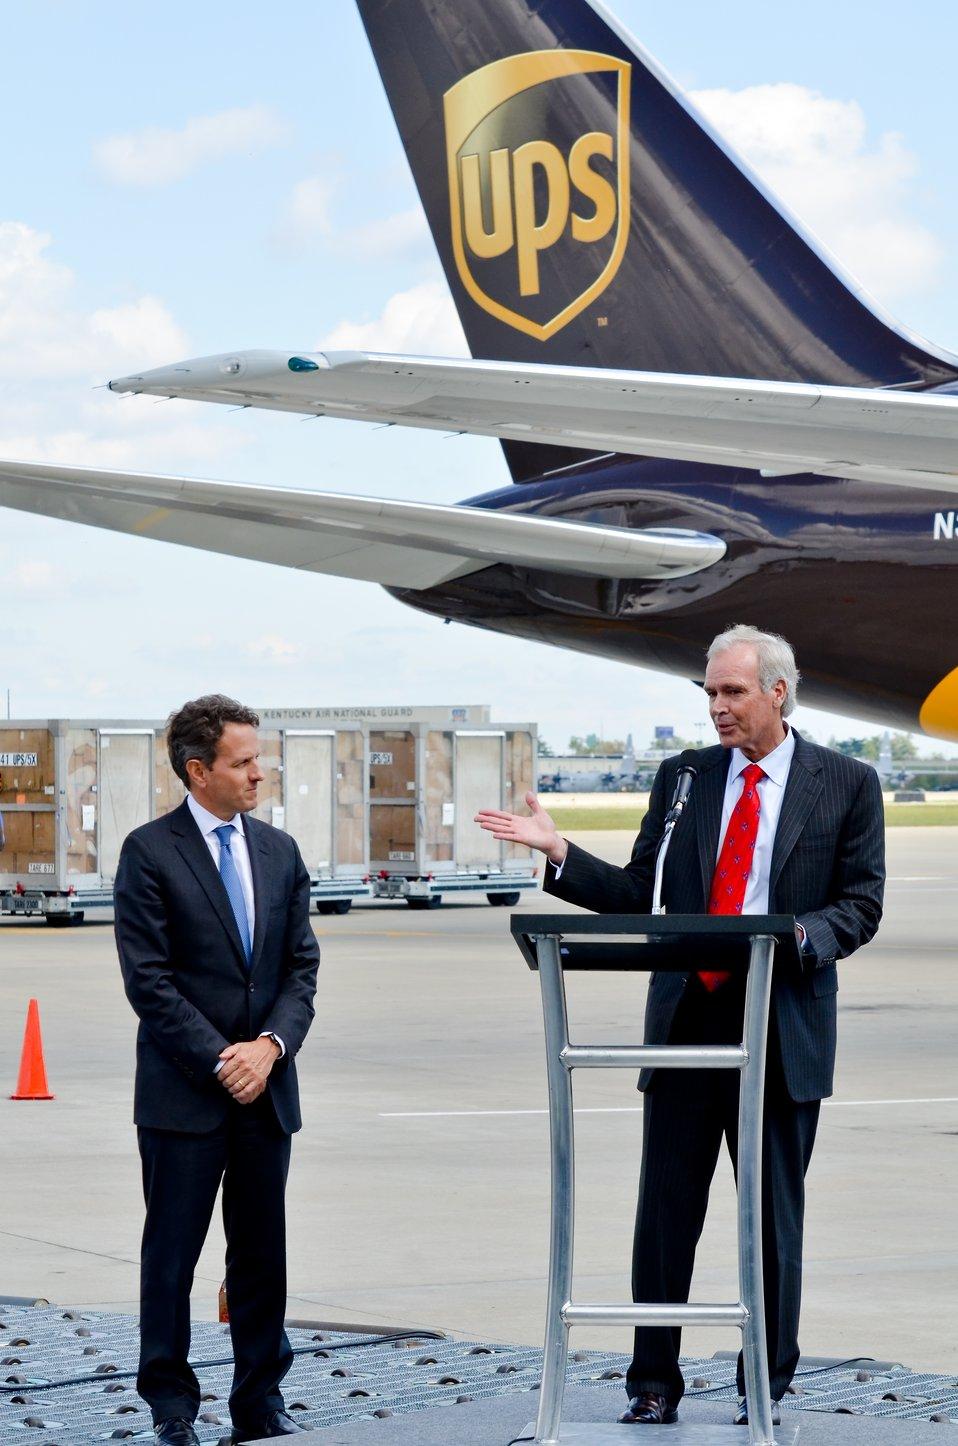 Secretary Geithner Visits UPS